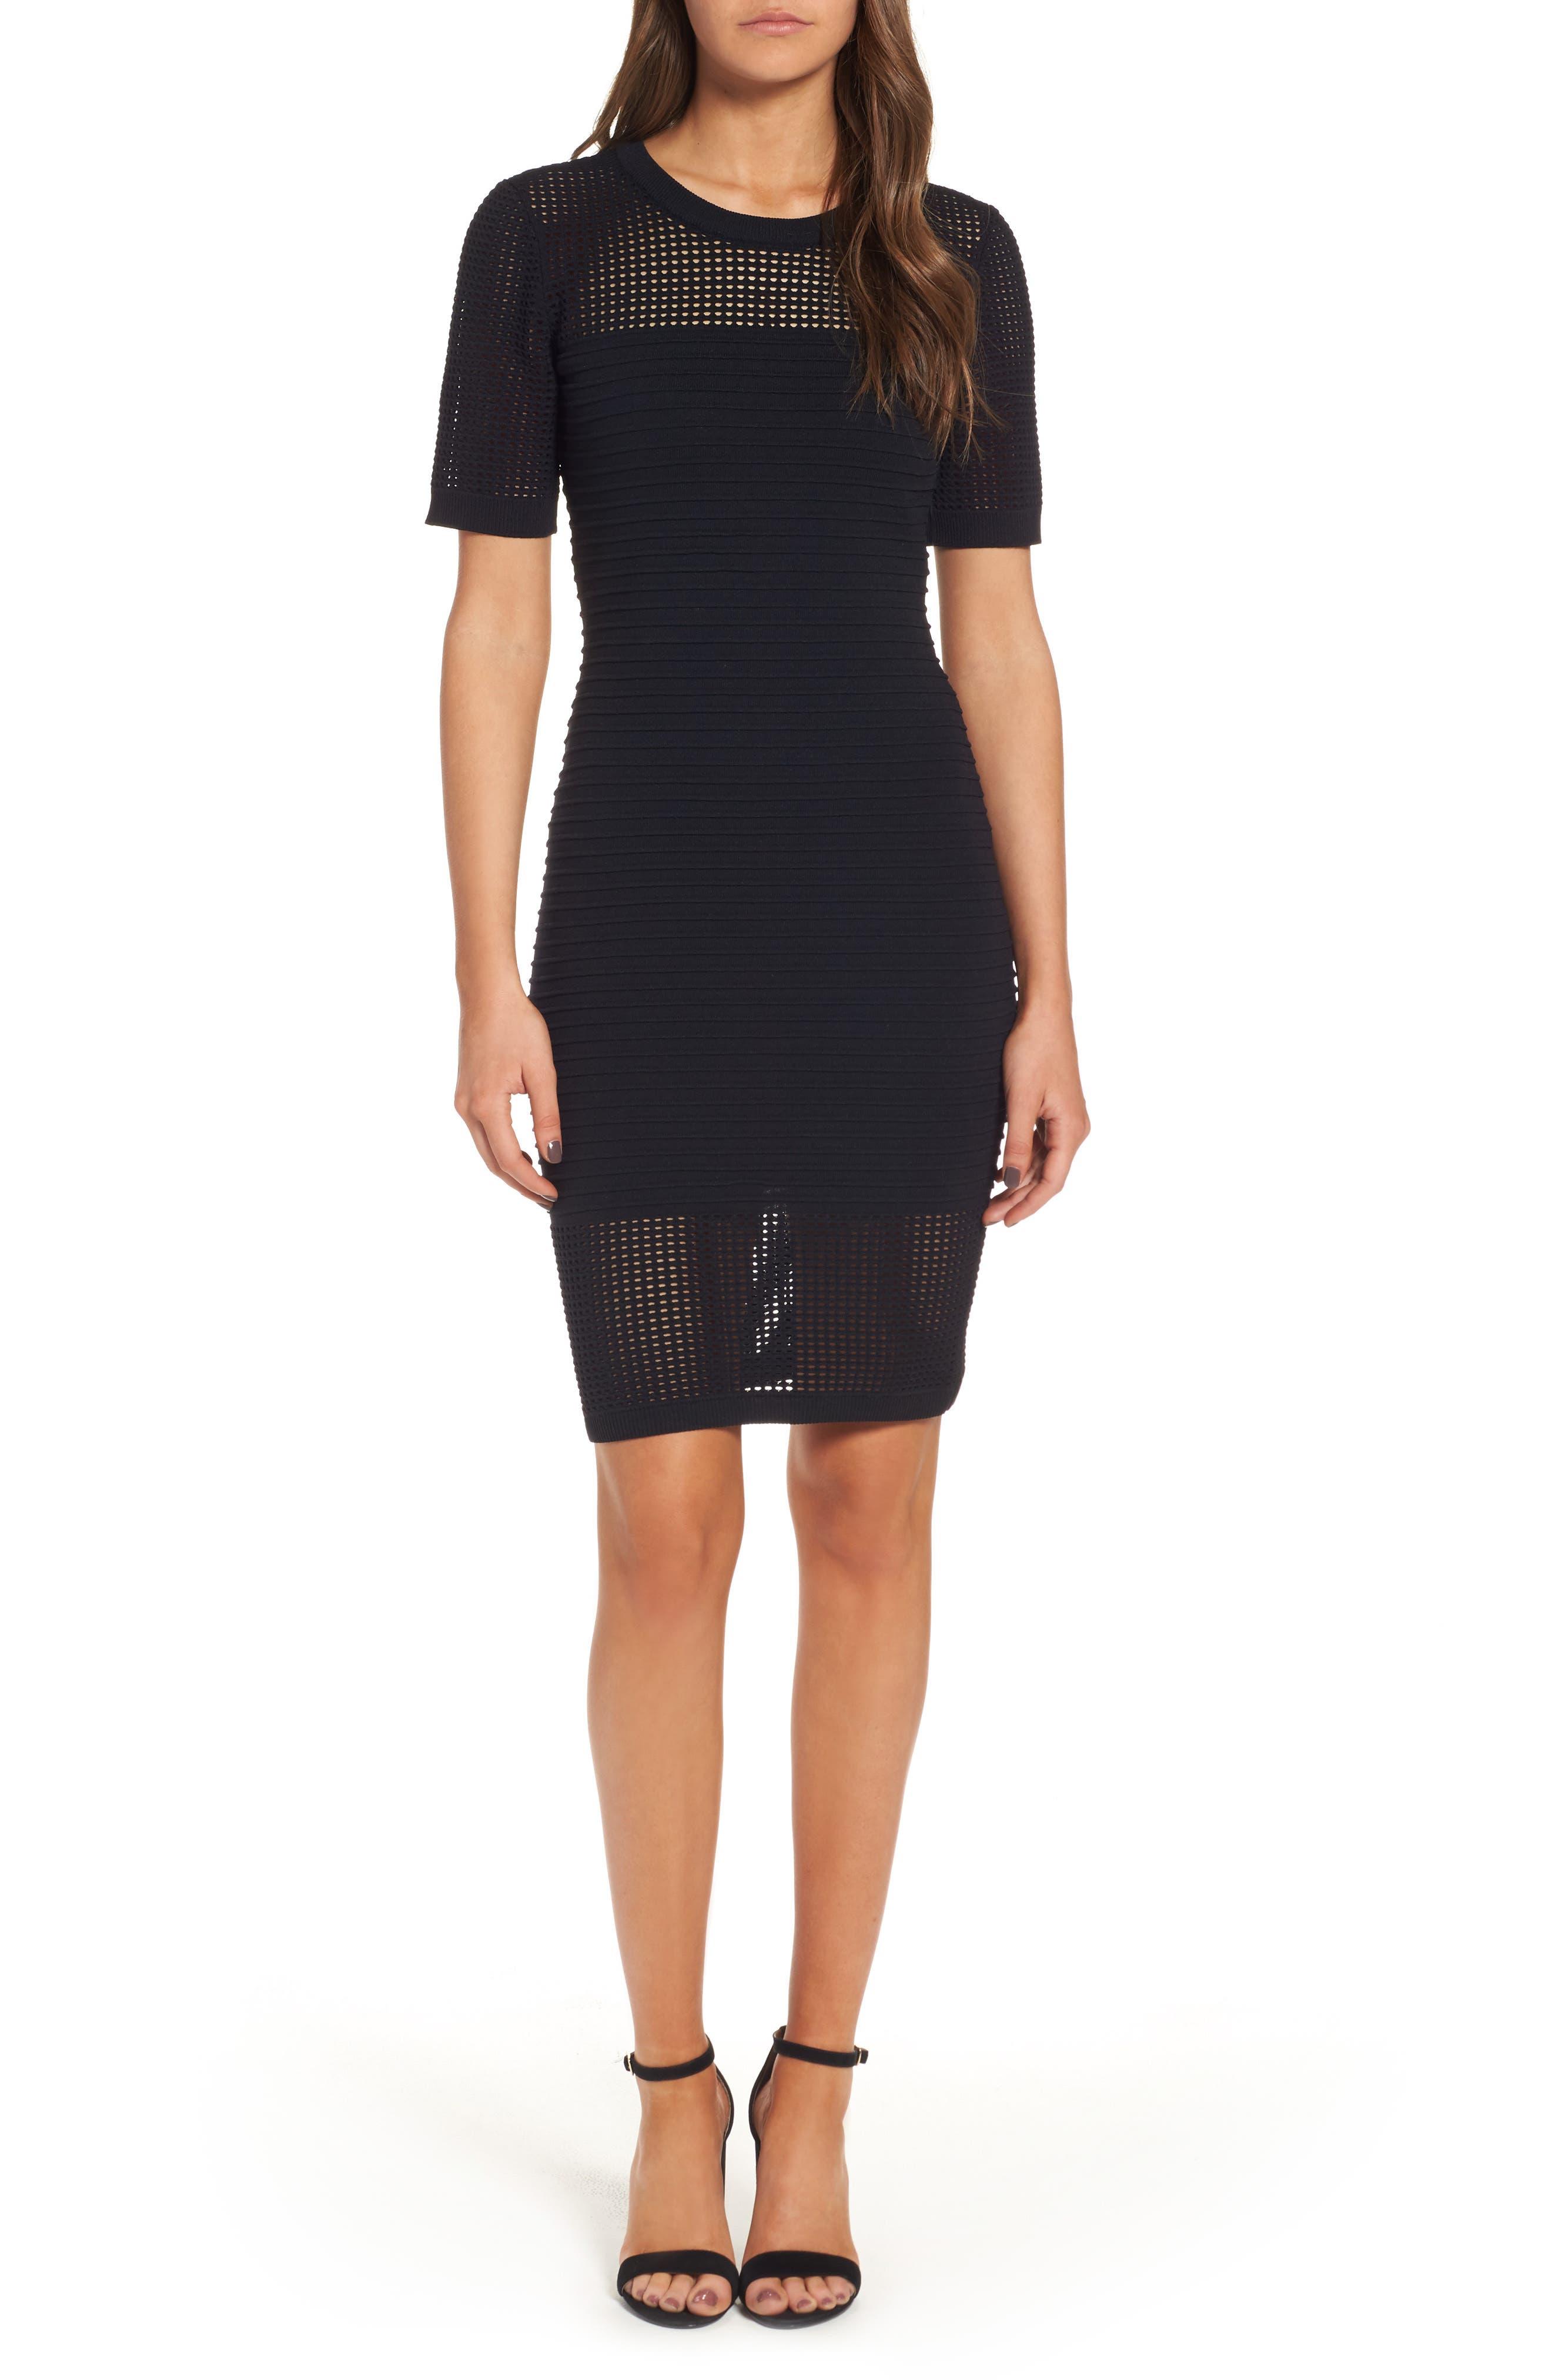 Sentimental NY Open Weave Body-Con Dress